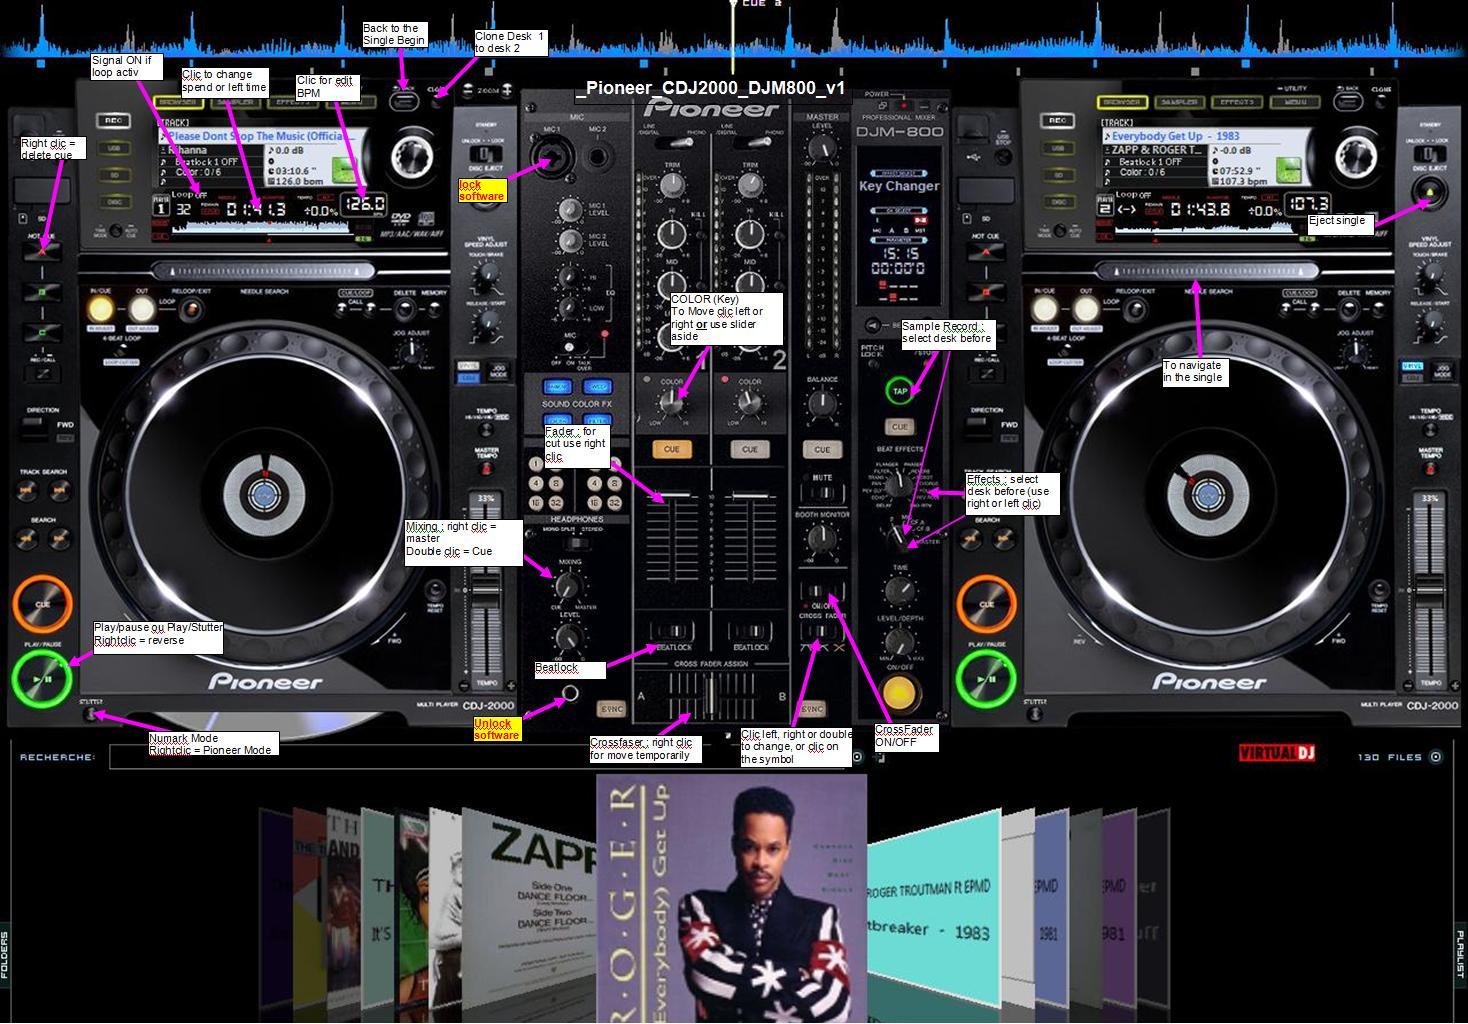 CDJ SKINS GRATUIT DJ TÉLÉCHARGER VIRTUAL PIONEER 2000